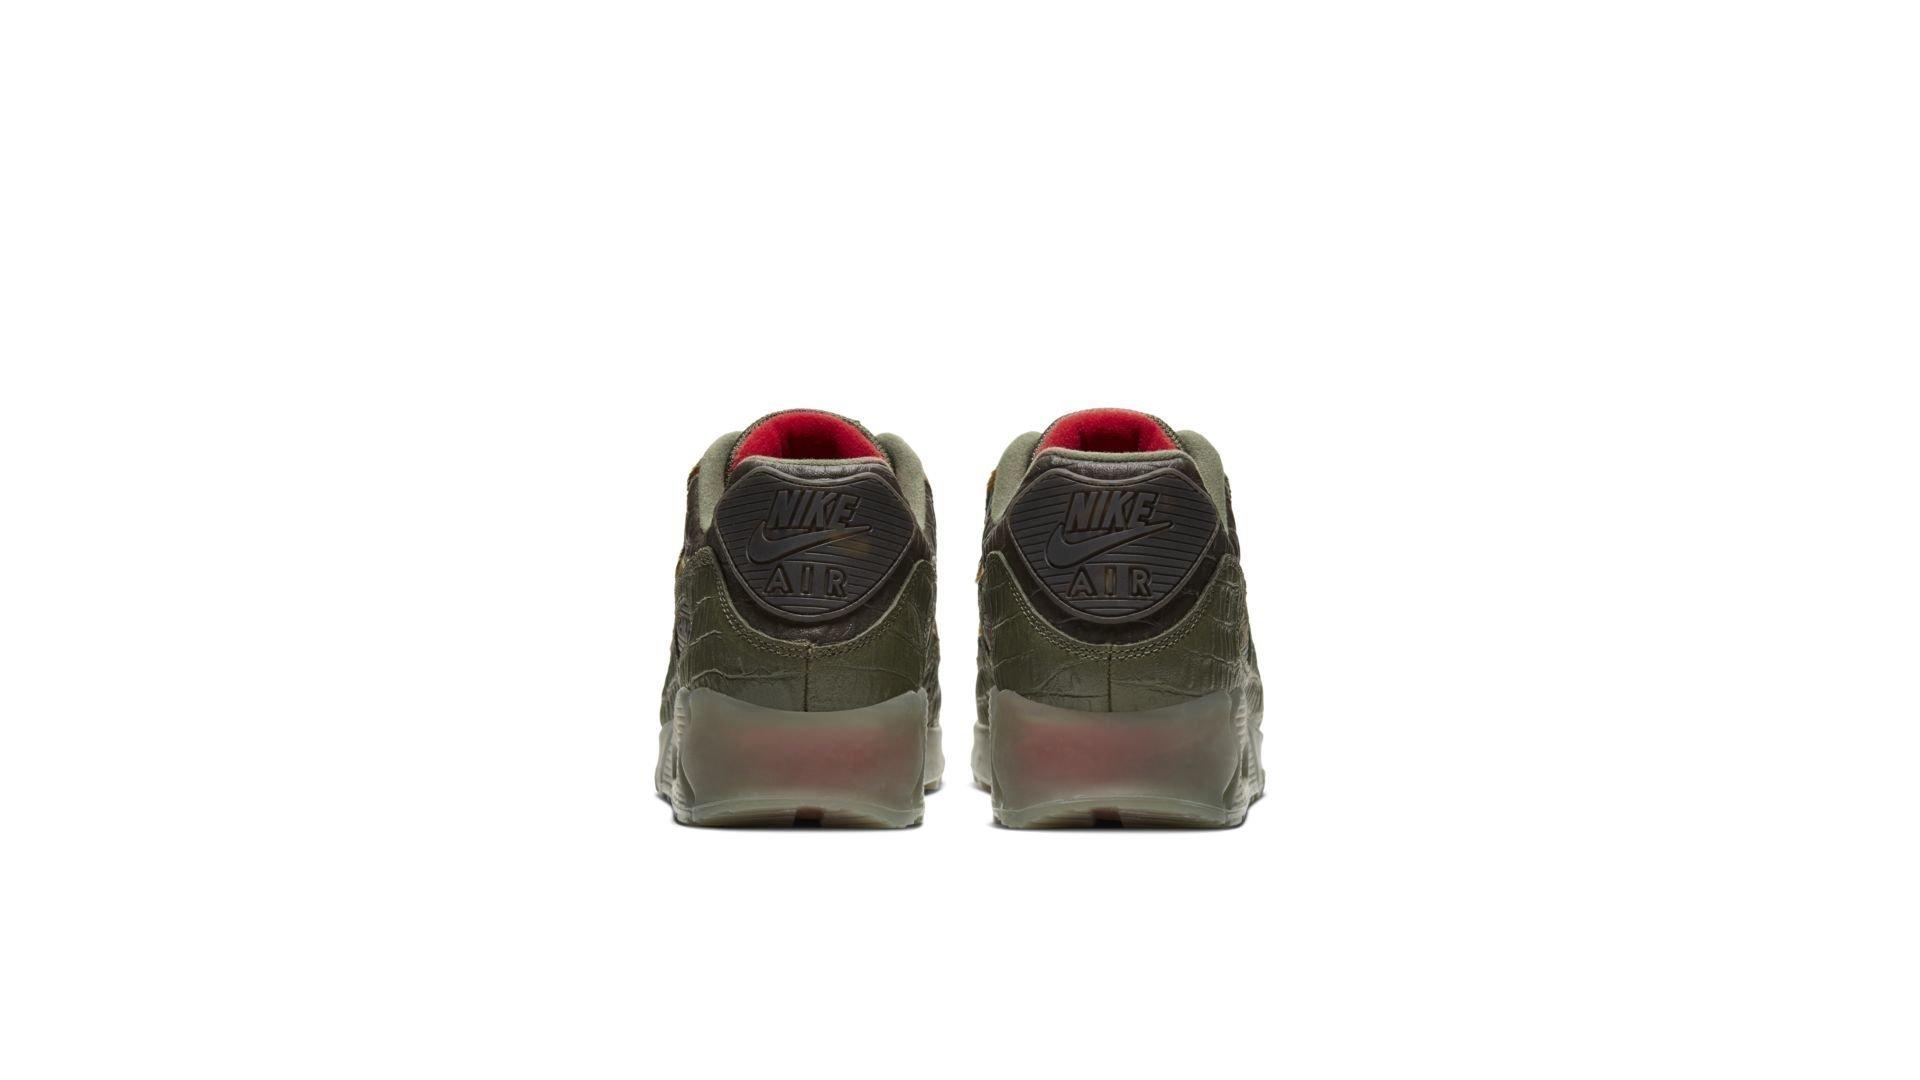 Laatste Nike Air Max 90 Camo Croc 'Cargo Khaki' CU0675 300